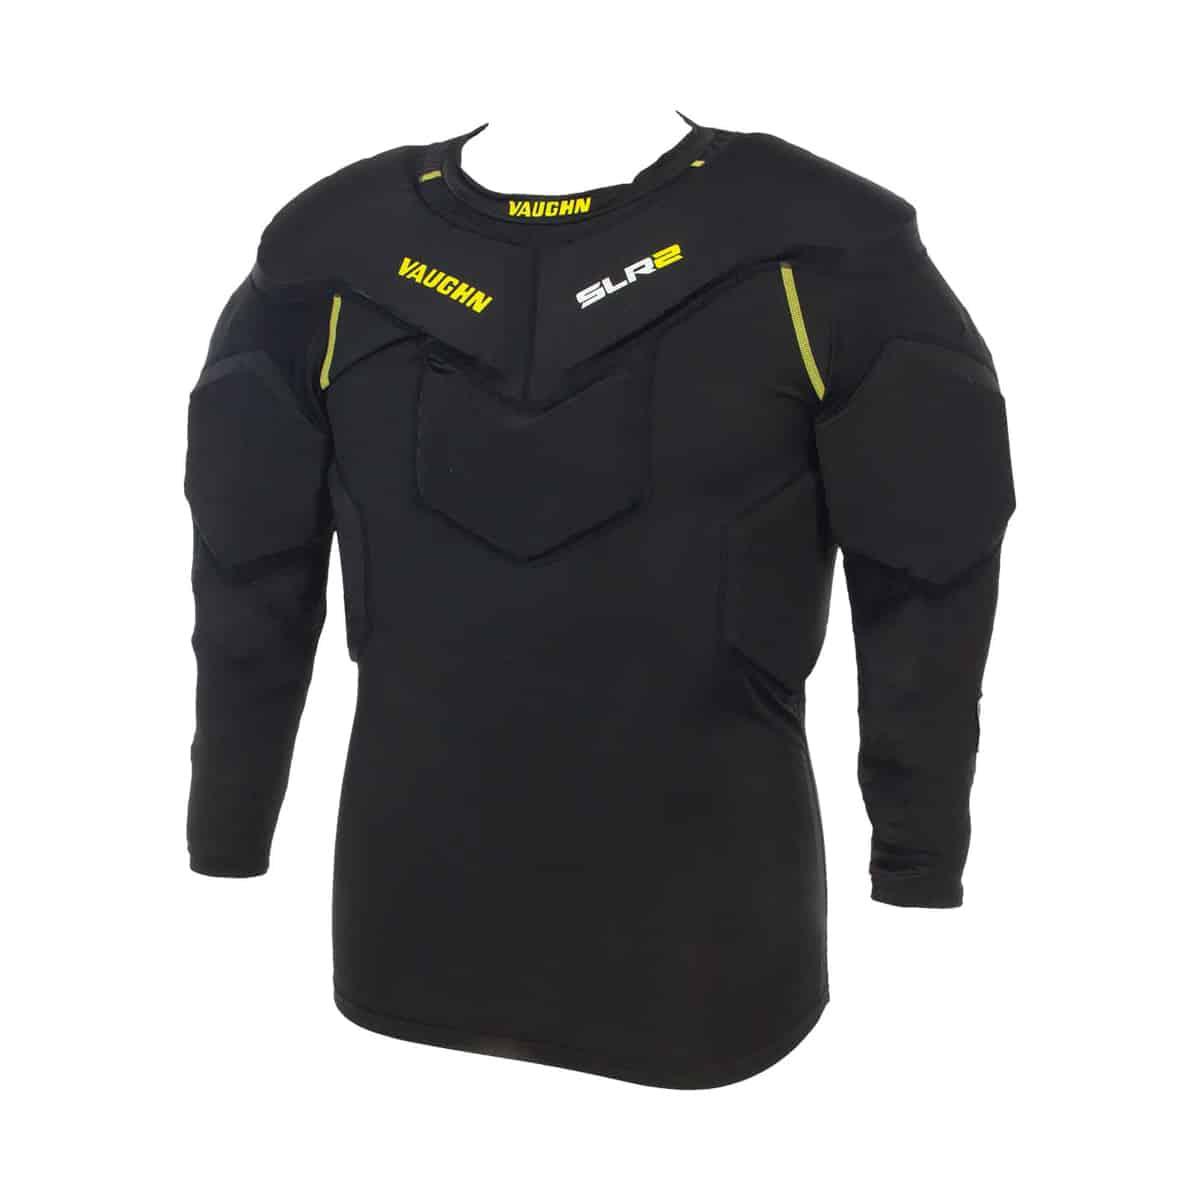 00f50de11b9 Vaughn Ventus SLR2 Padded Compression Senior Goalie Shirt